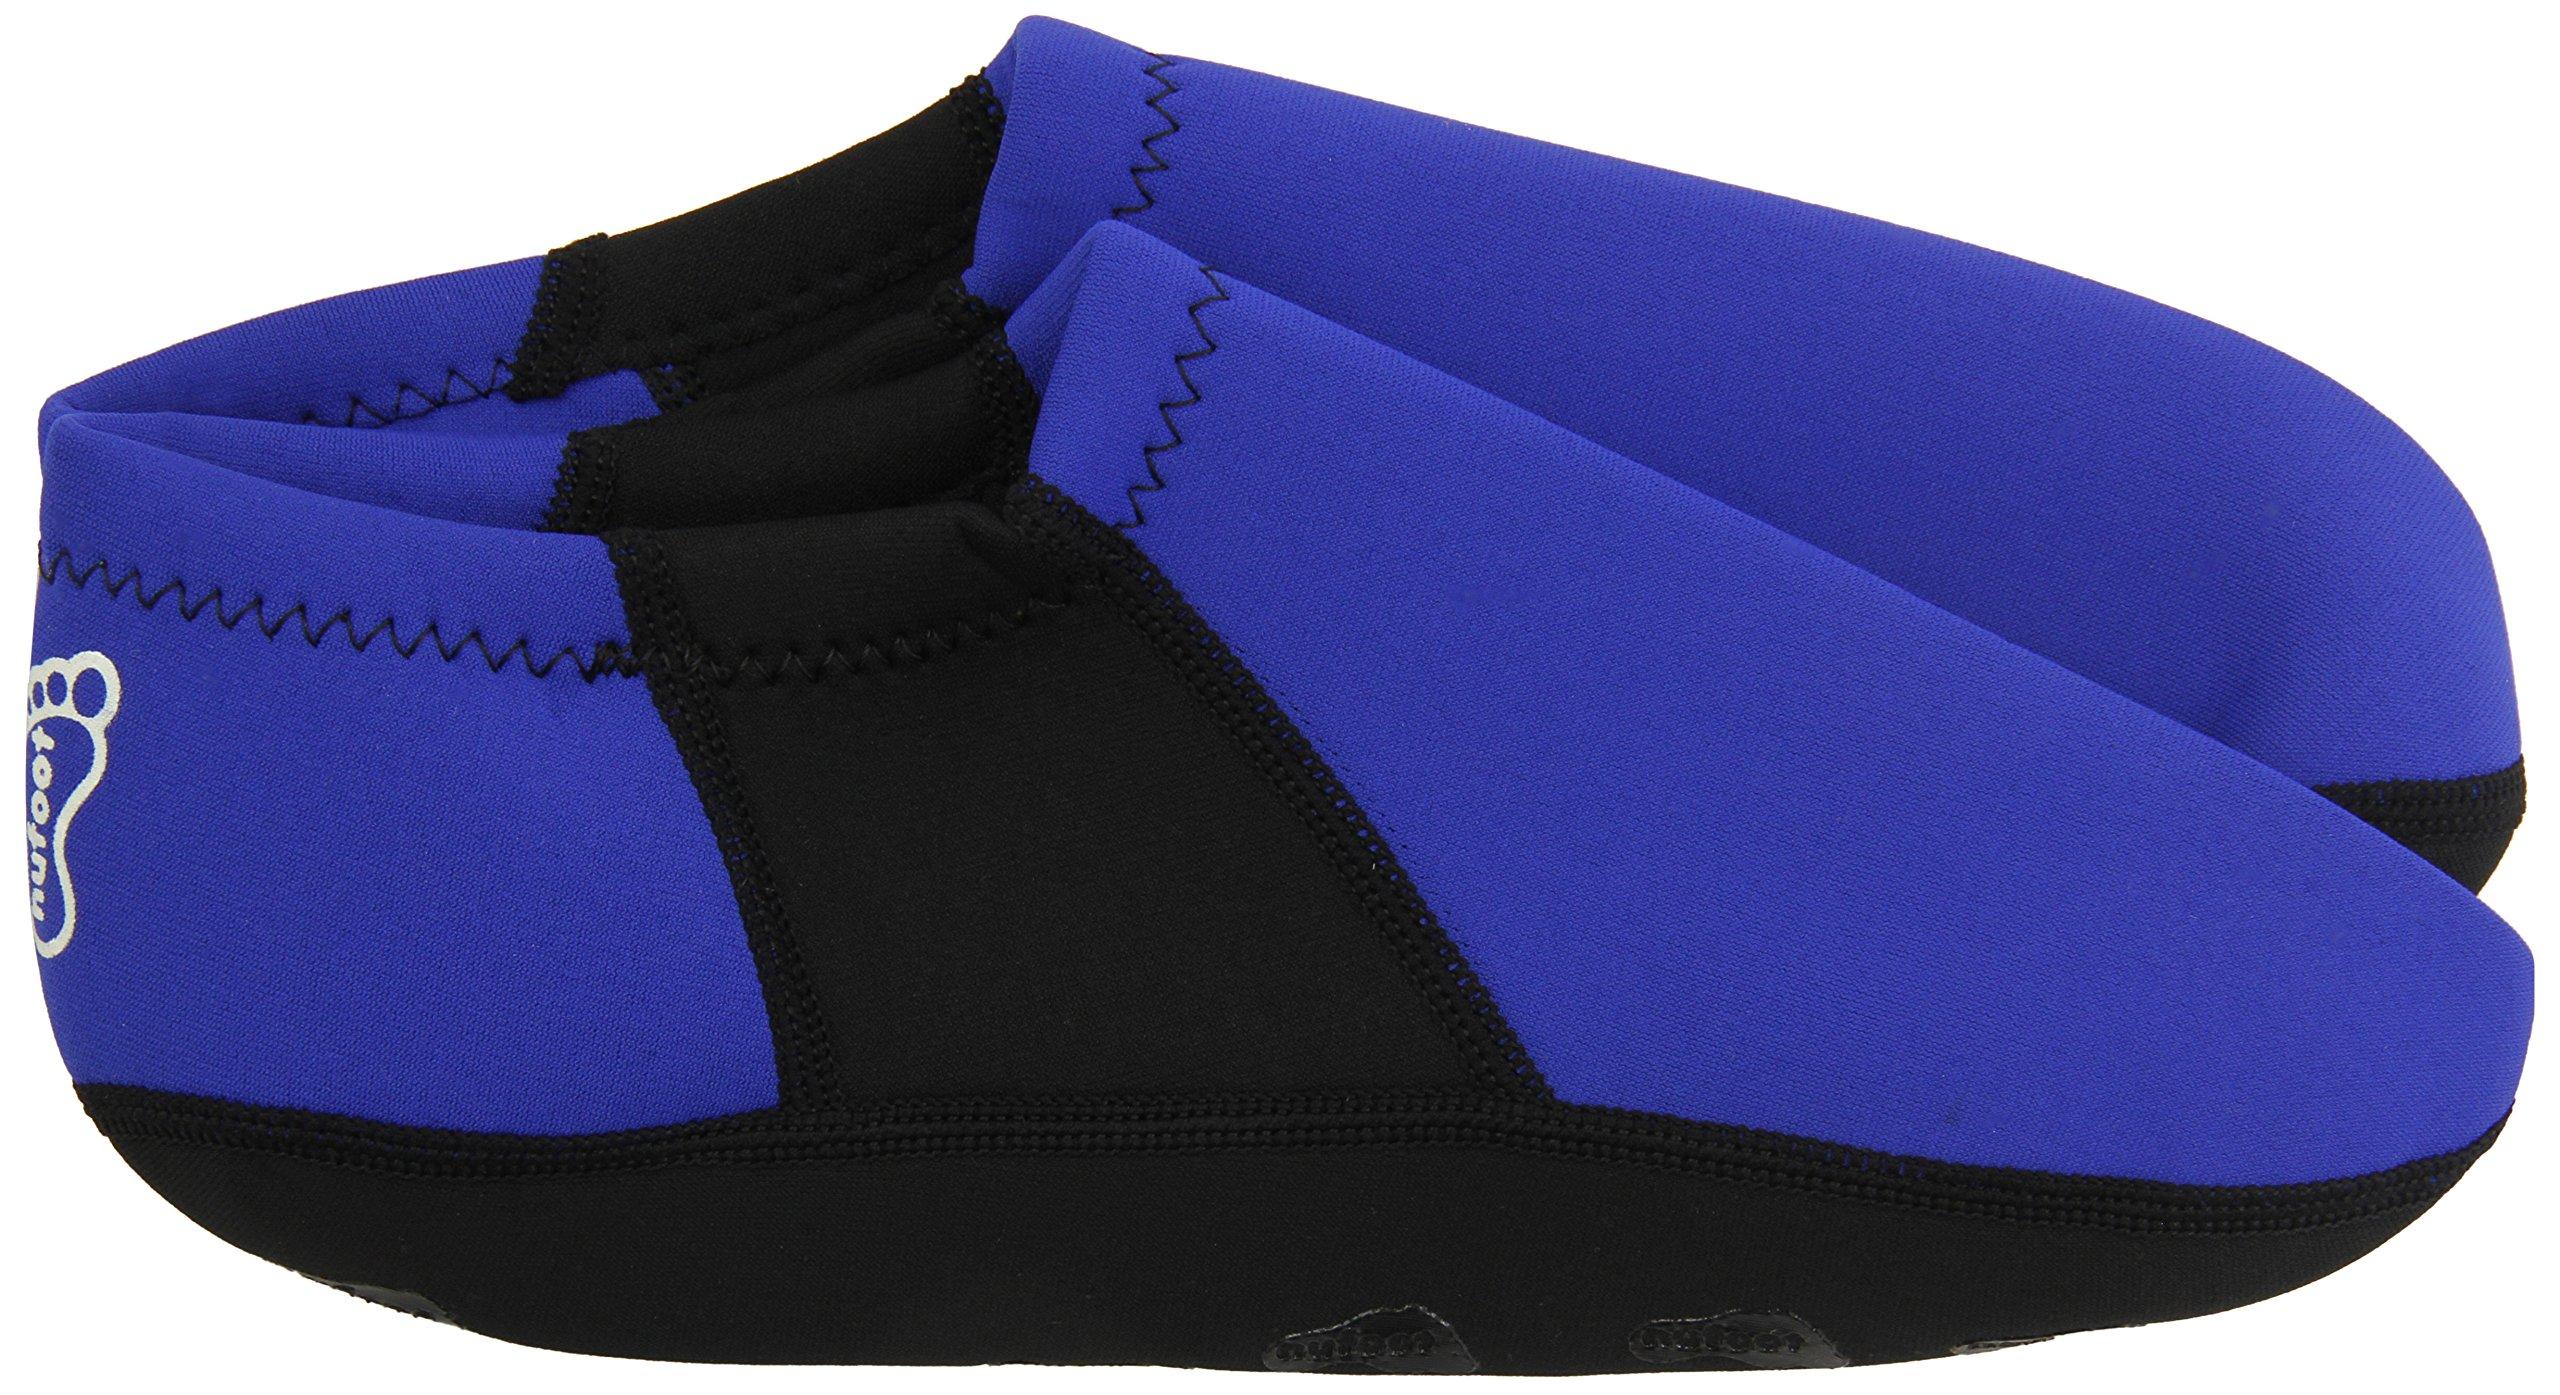 c1ff7b9e79ca Amazon.com  NuFoot Booties Men s Shoes